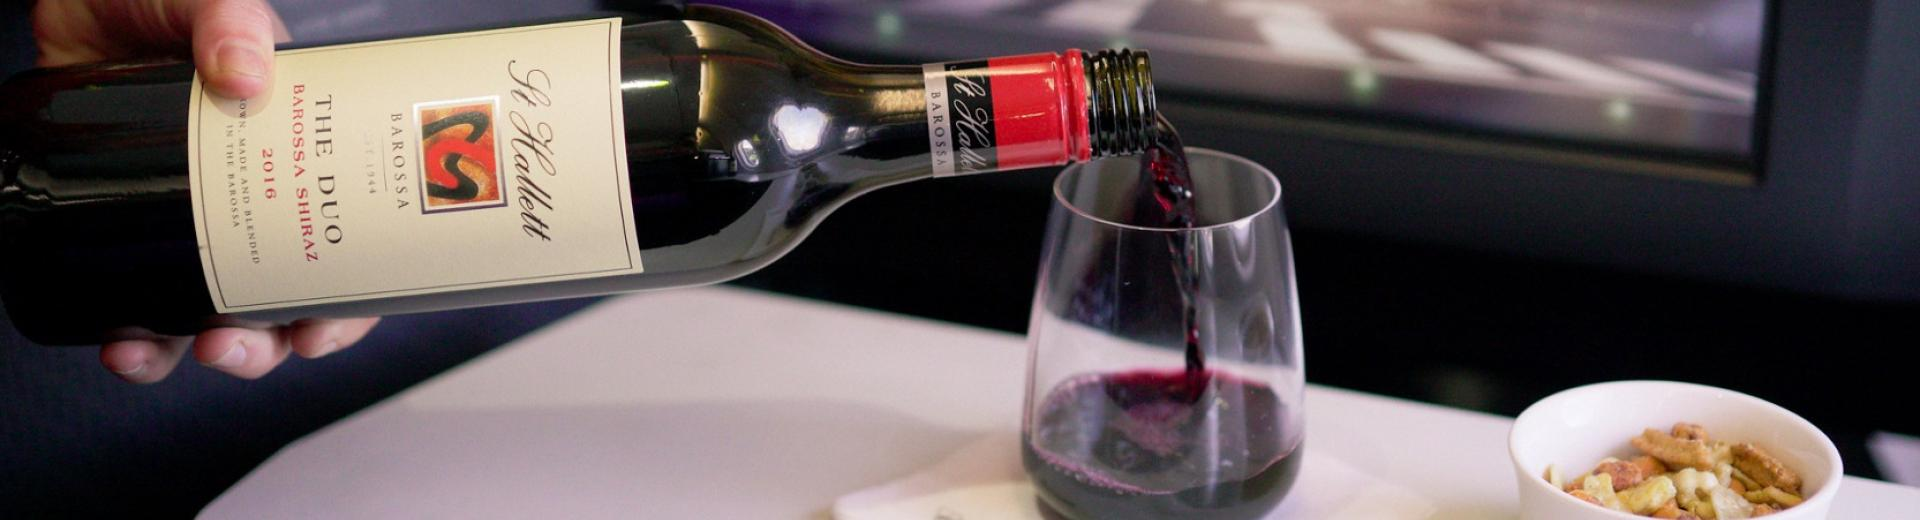 Virgin Australia The Duo wine